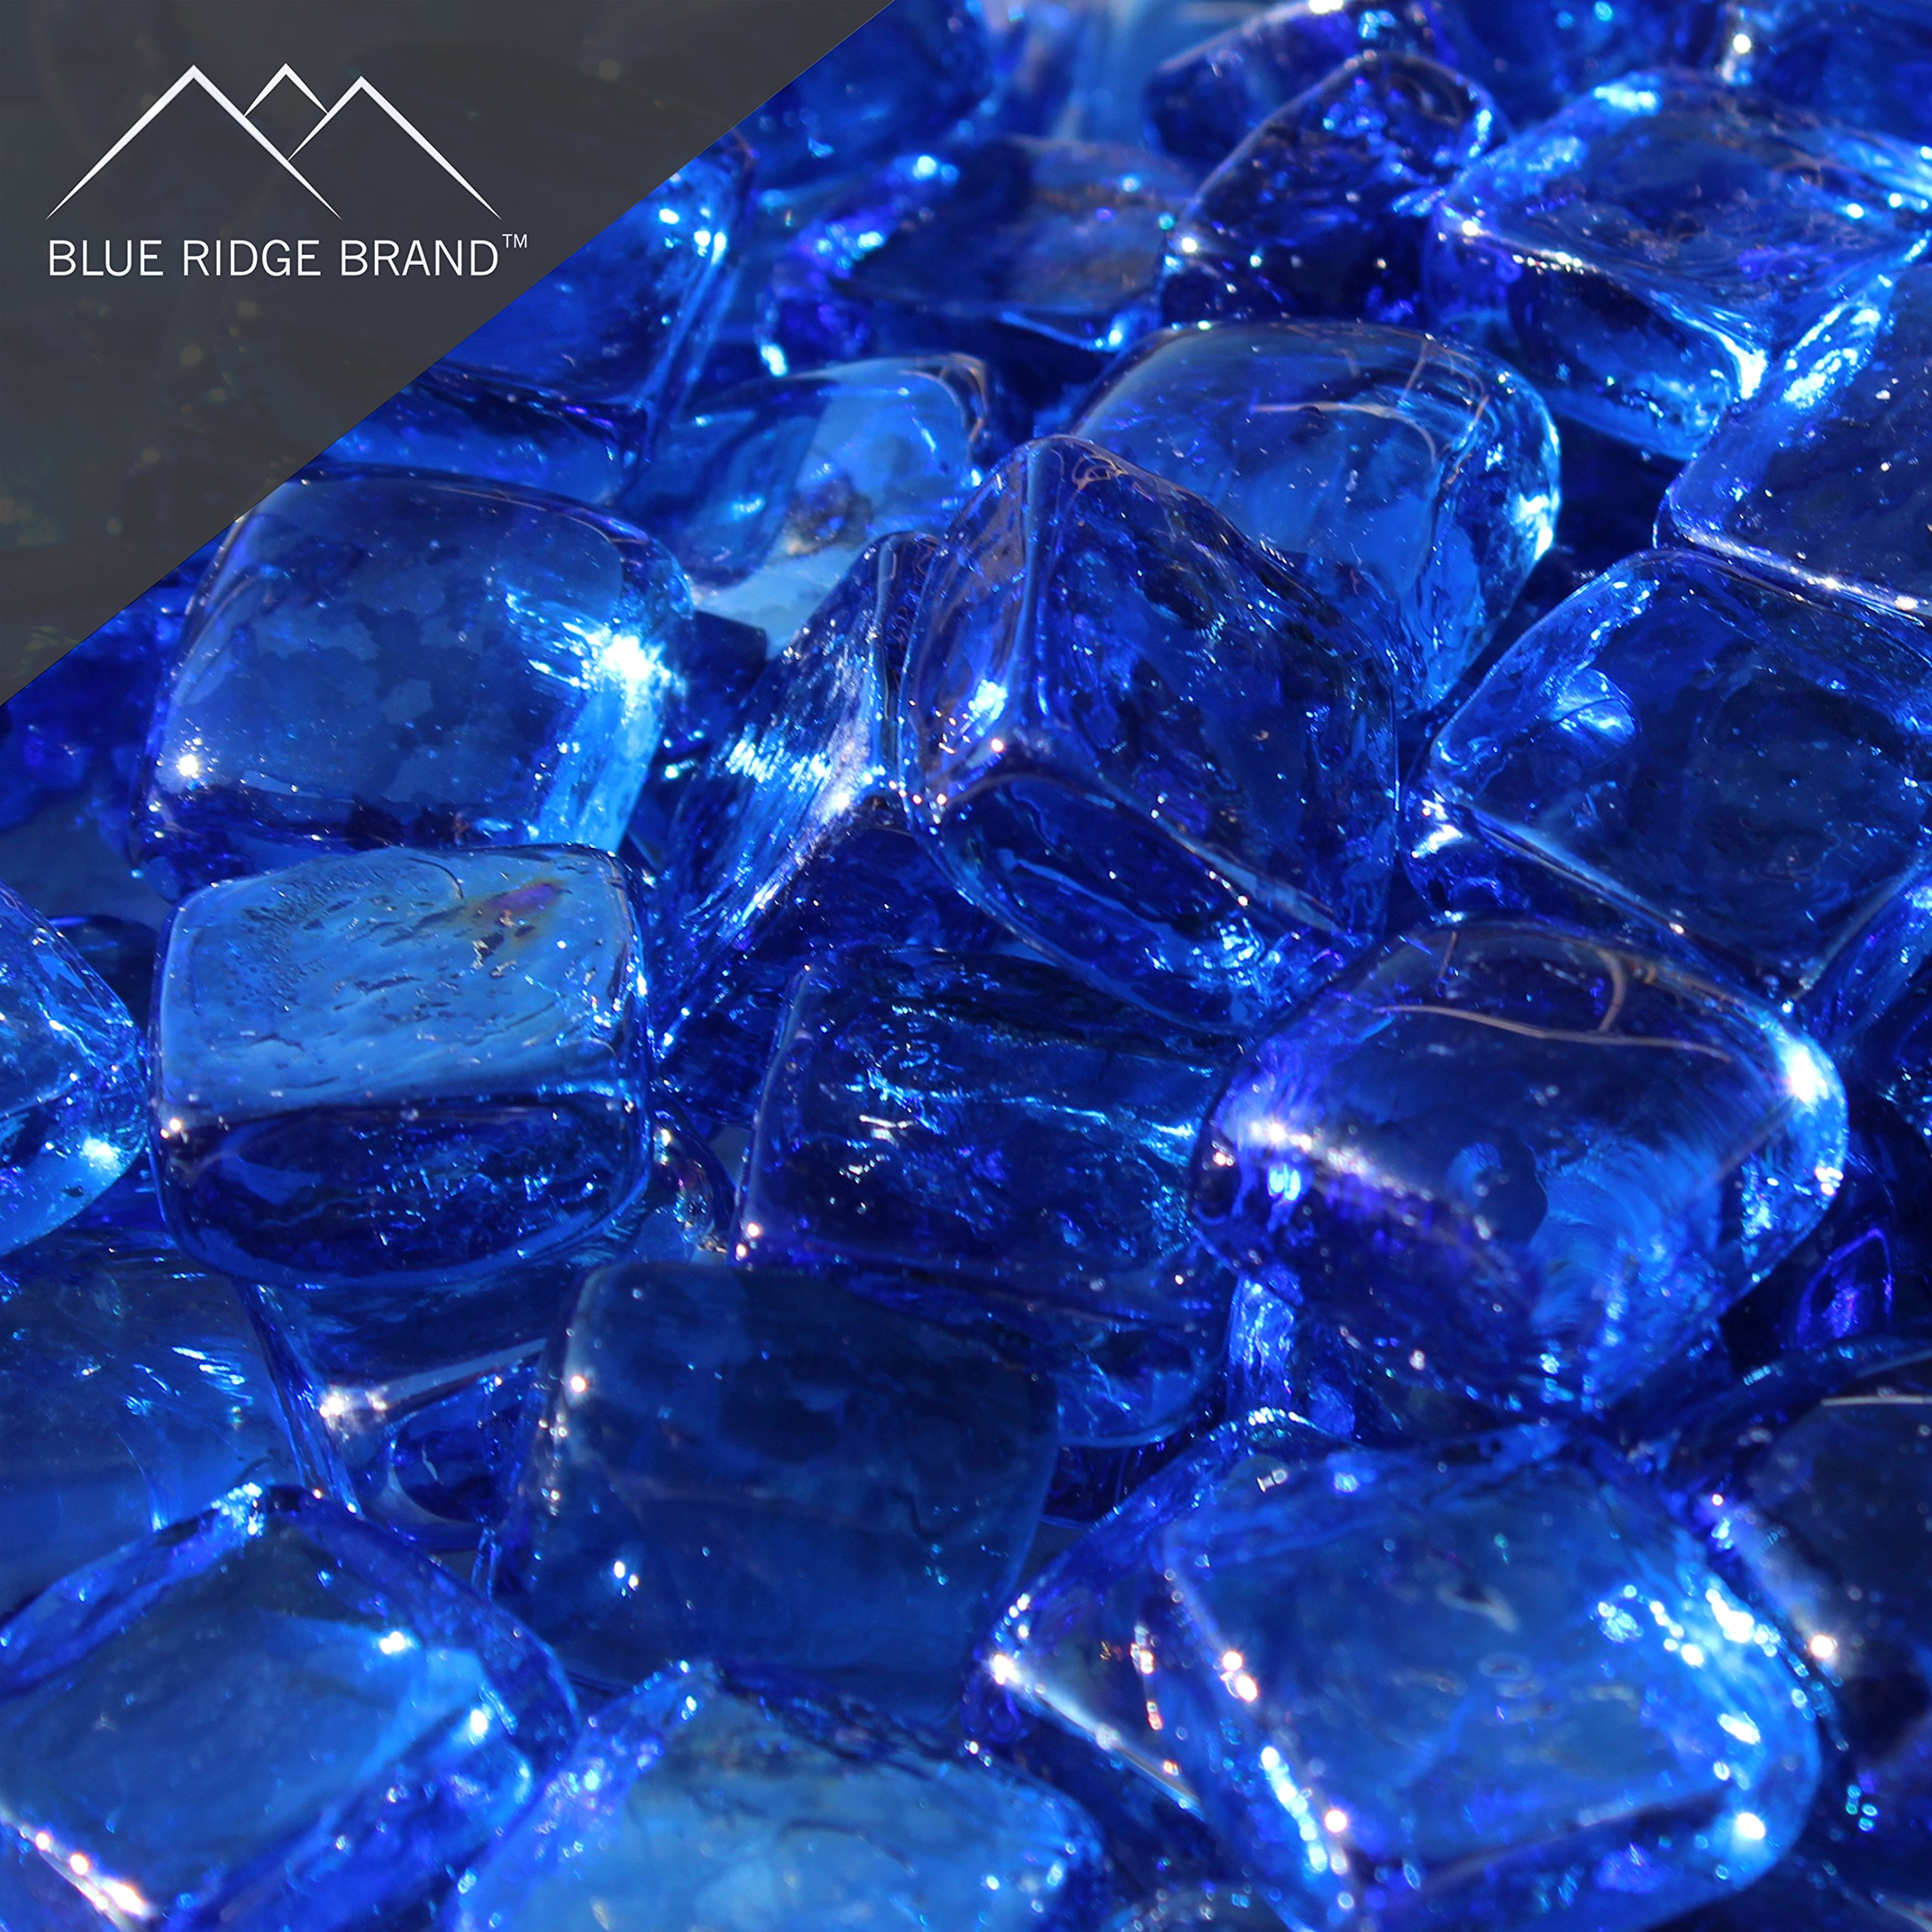 Blue Ridge Brand™ Light Blue Reflective Fire Glass Cubes - 50-Pound Professional Grade Fire Pit Glass - 3/4'' Reflective Fire Glass Bulk Pack - Glass Rock Contractor Pack